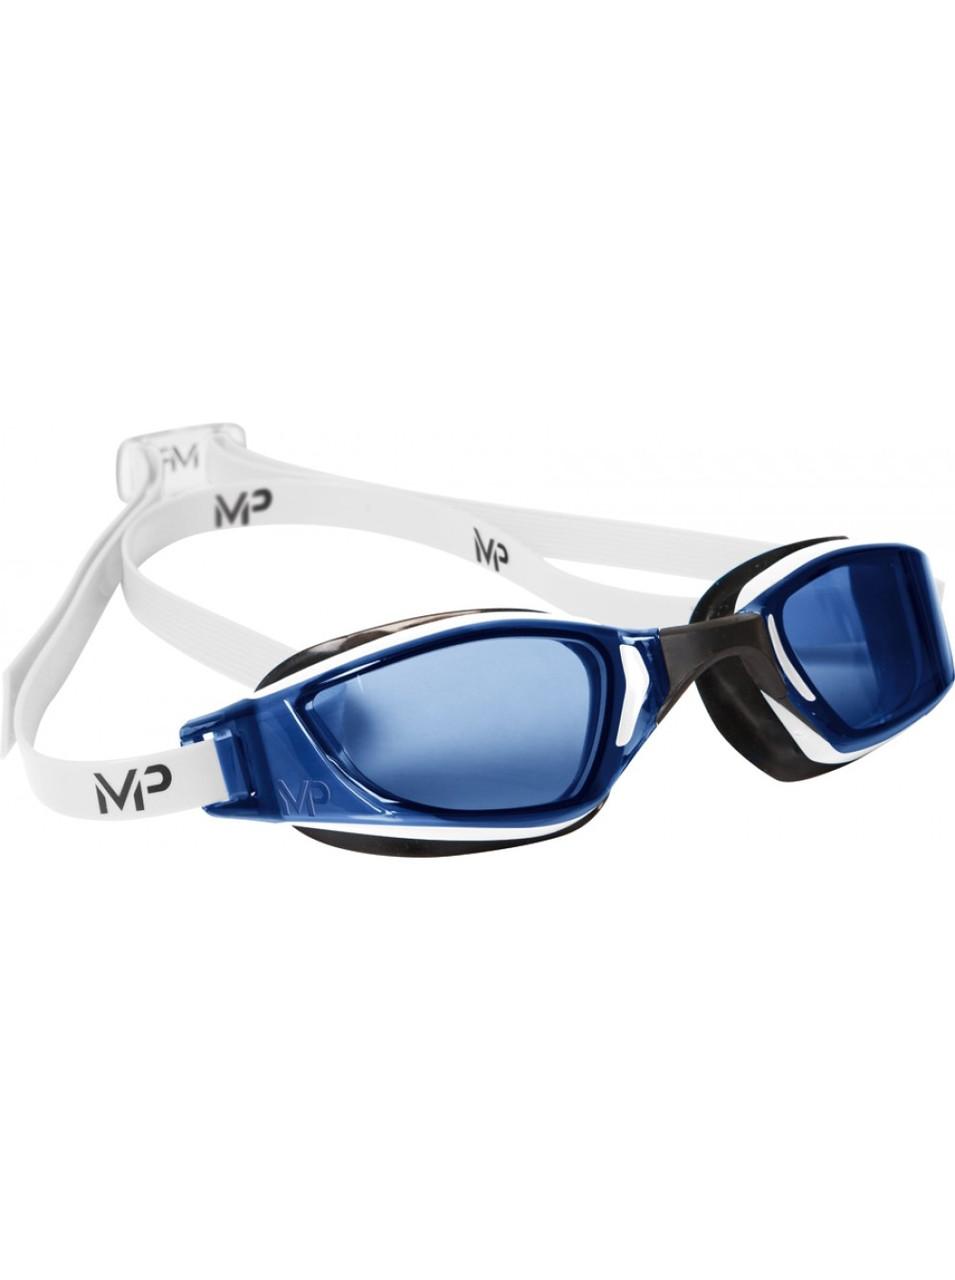 Очки для плавания Michael Phelps Xceed, фото 1